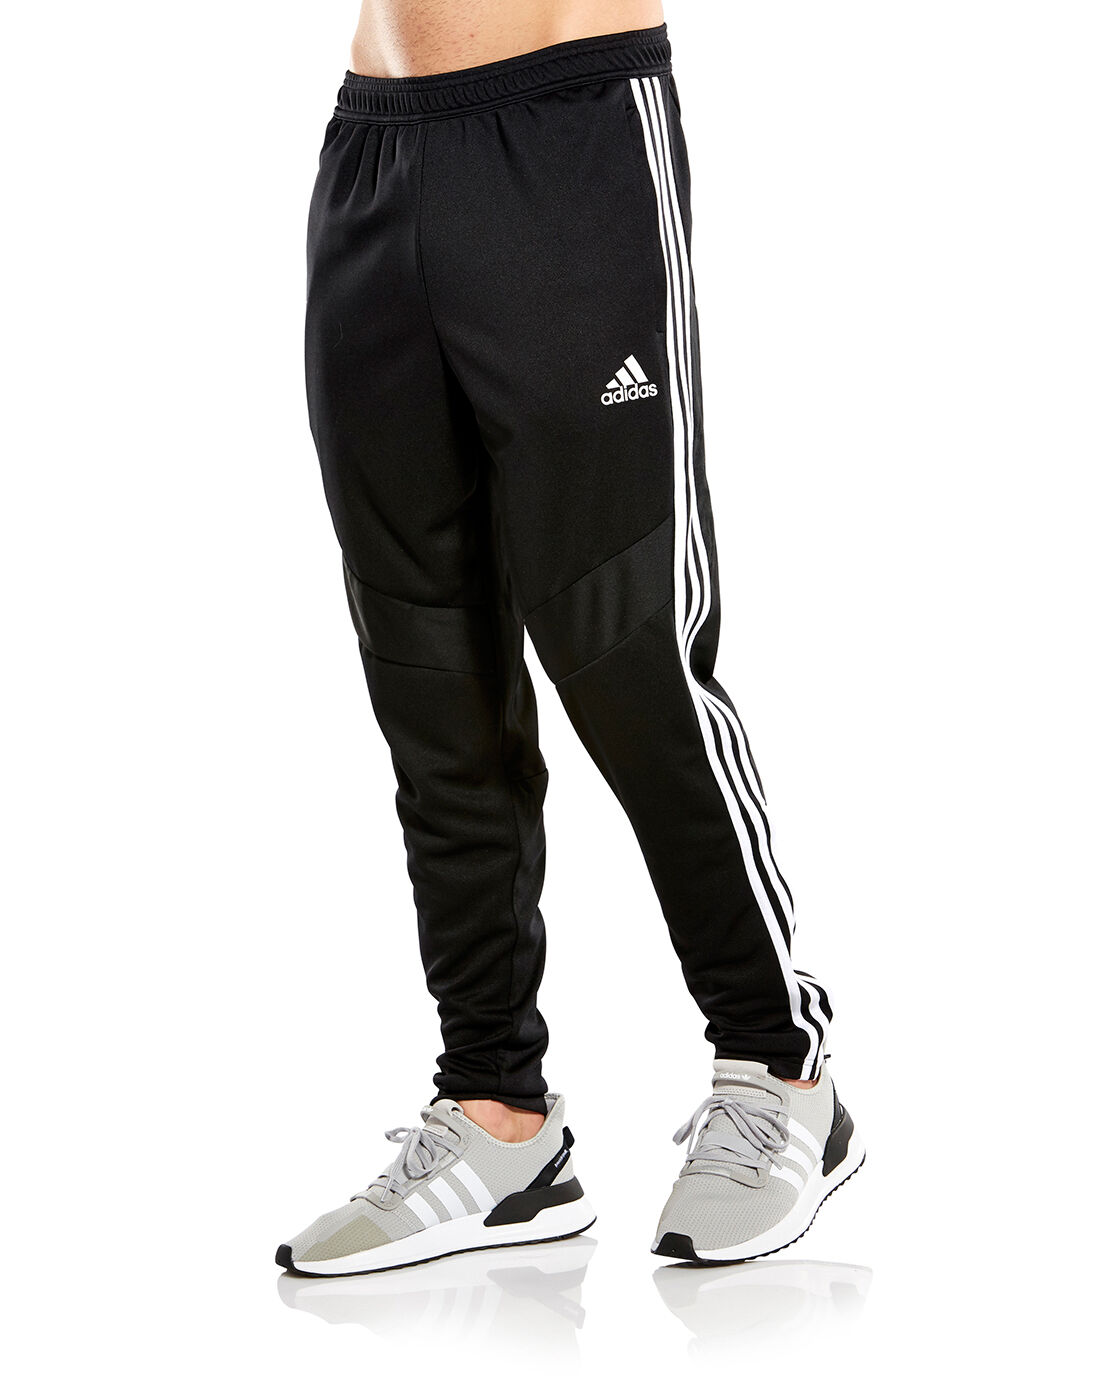 Men's Black adidas Tiro 19 Track Pants | Life Style Sports